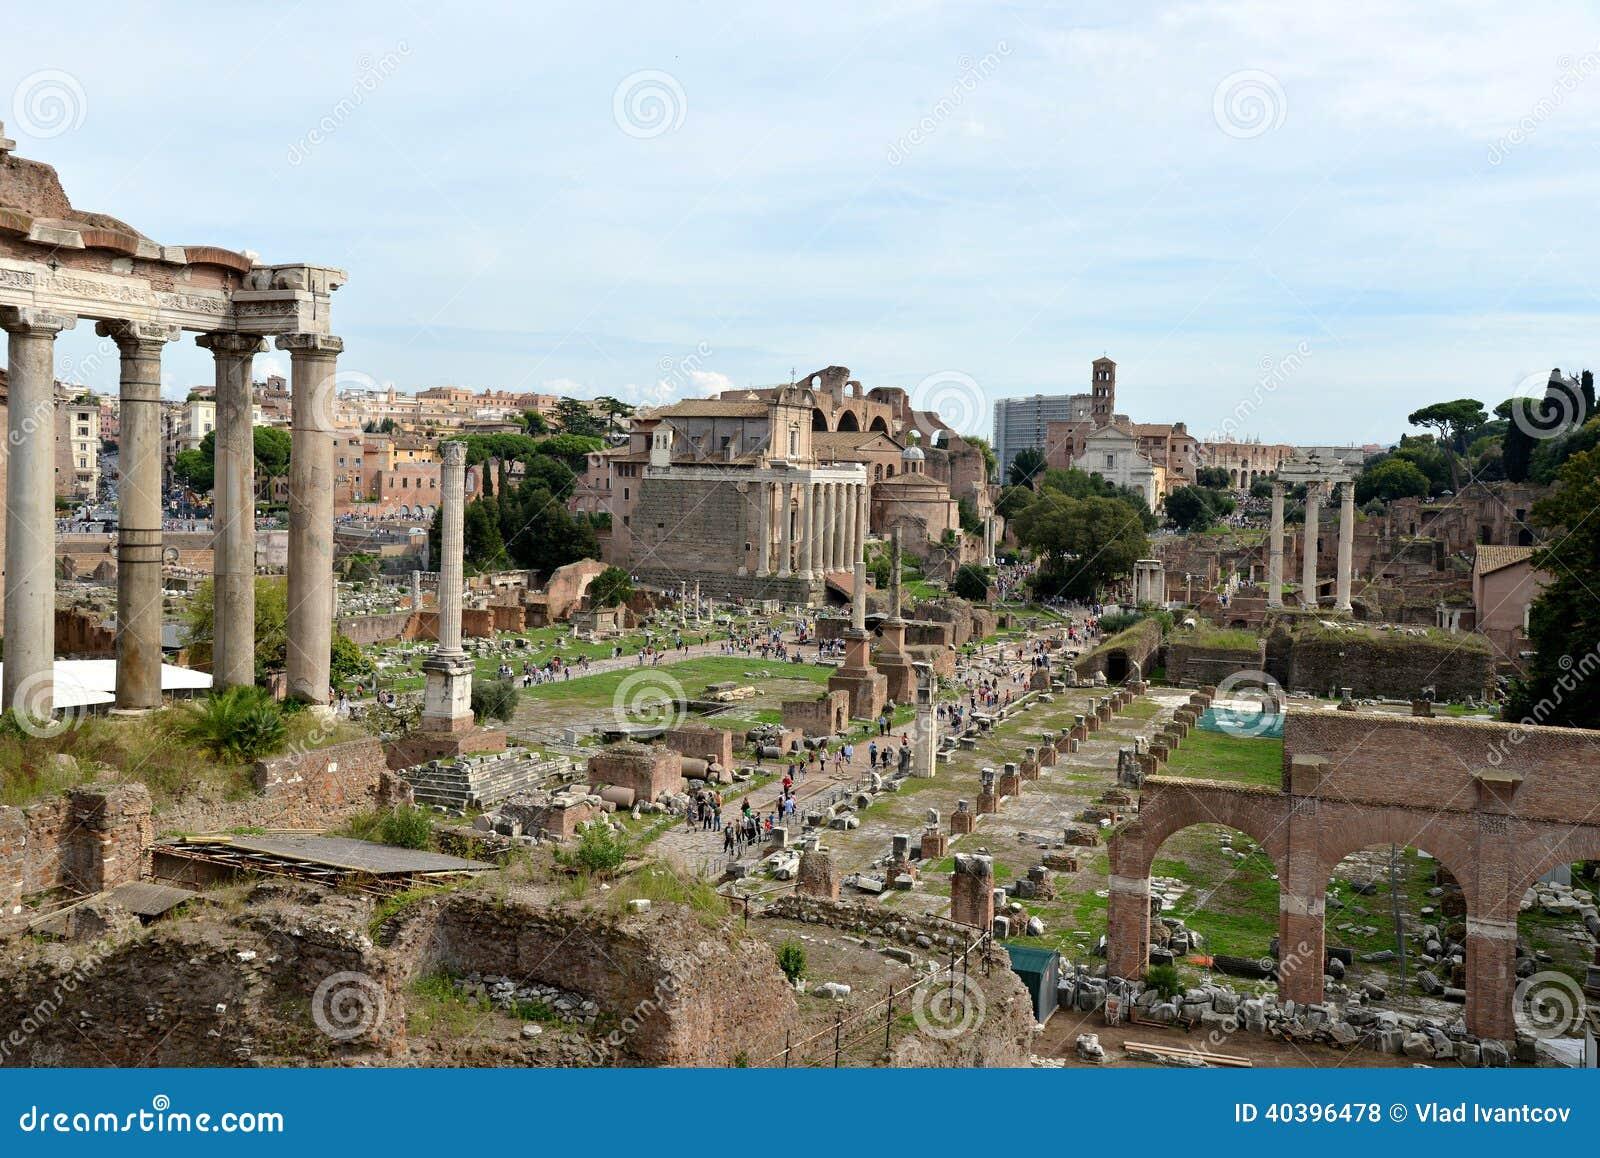 Roman ruins in rome stock photo image 40396478